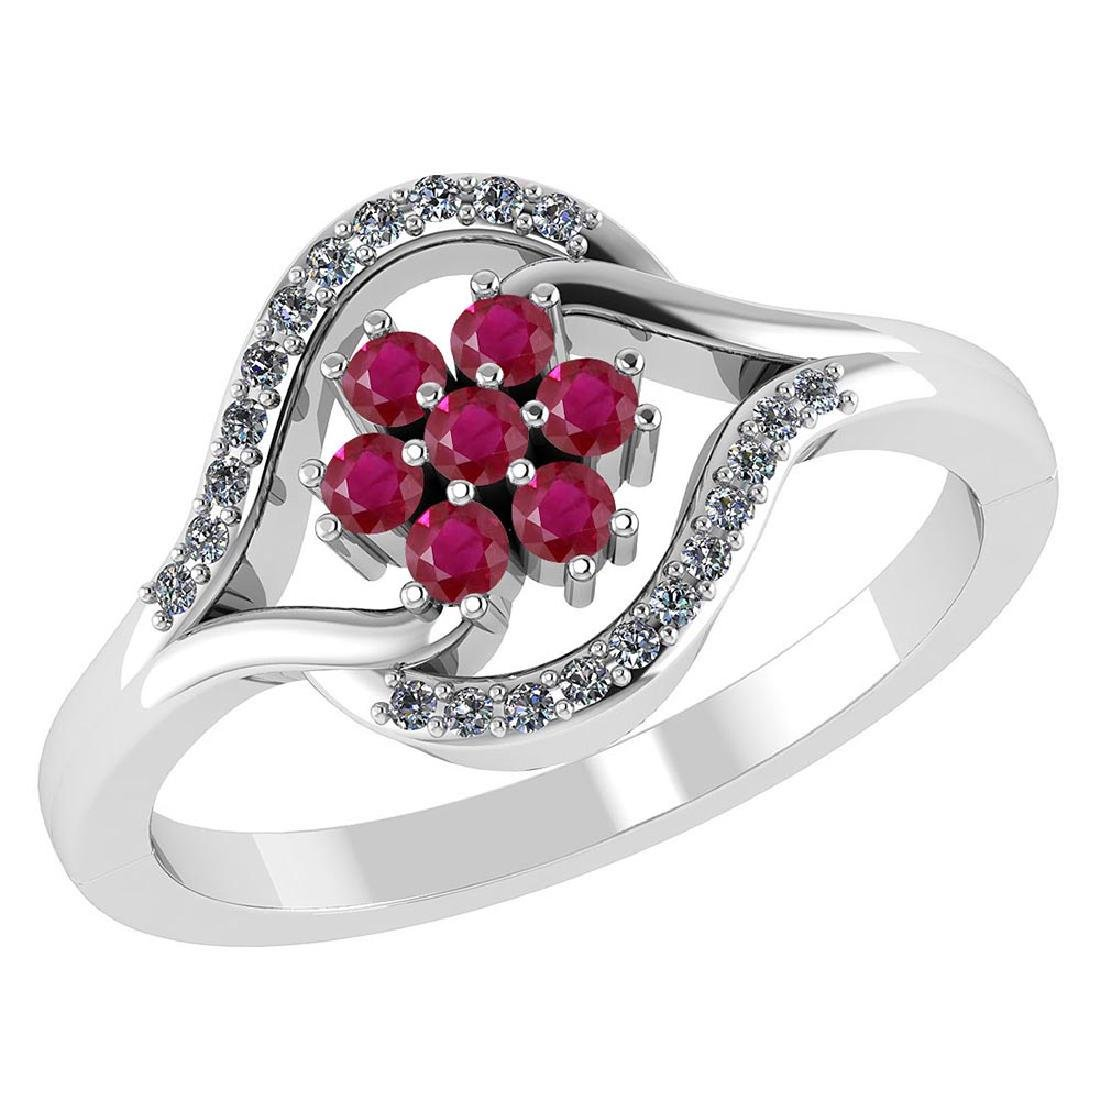 Certified 1.40 CTW Genuine Ruby And Diamond 14K White G